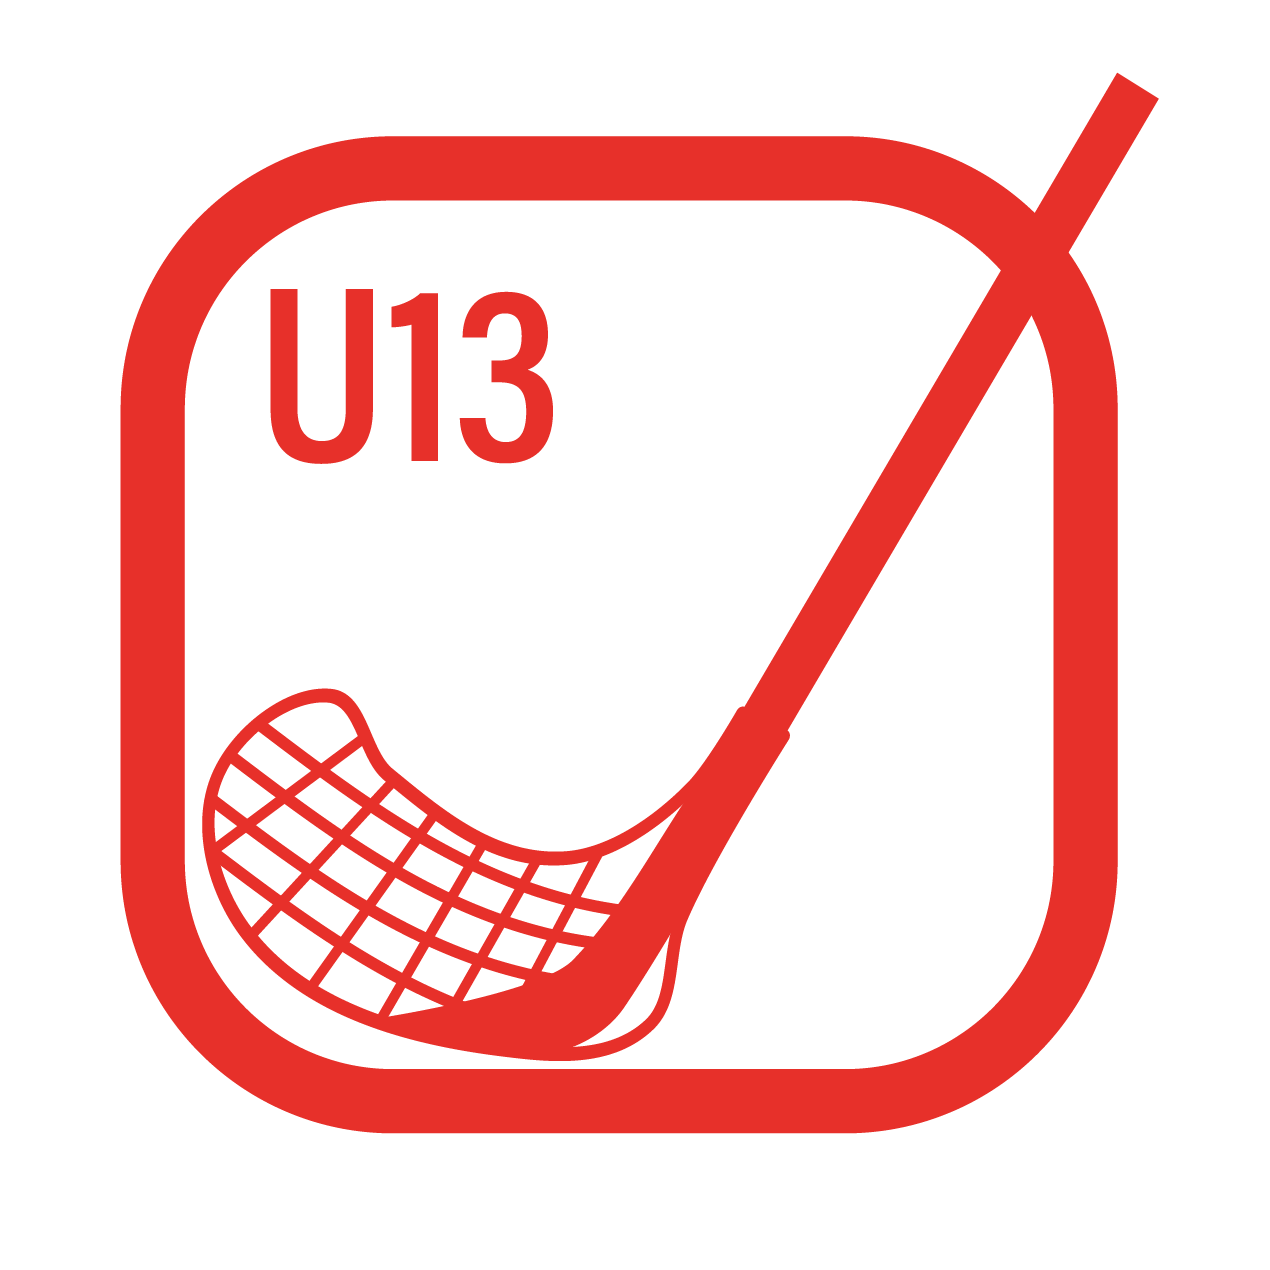 Unihockey U13